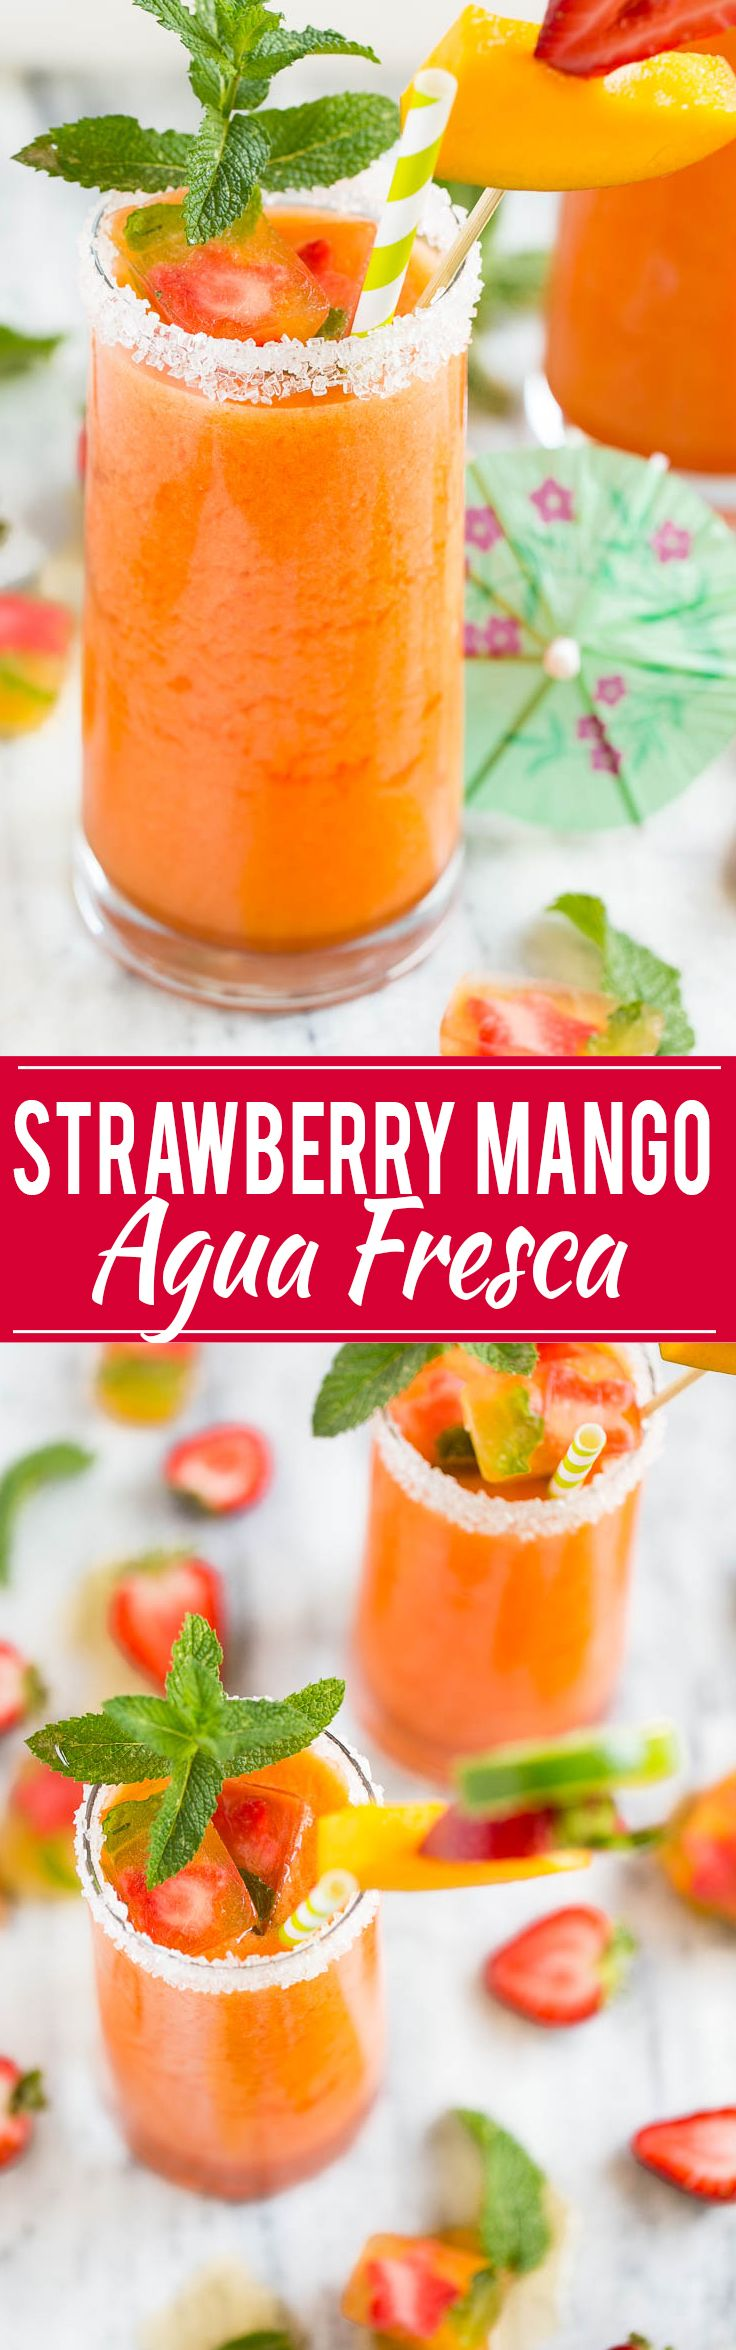 Strawberry Mango Agua Fresca